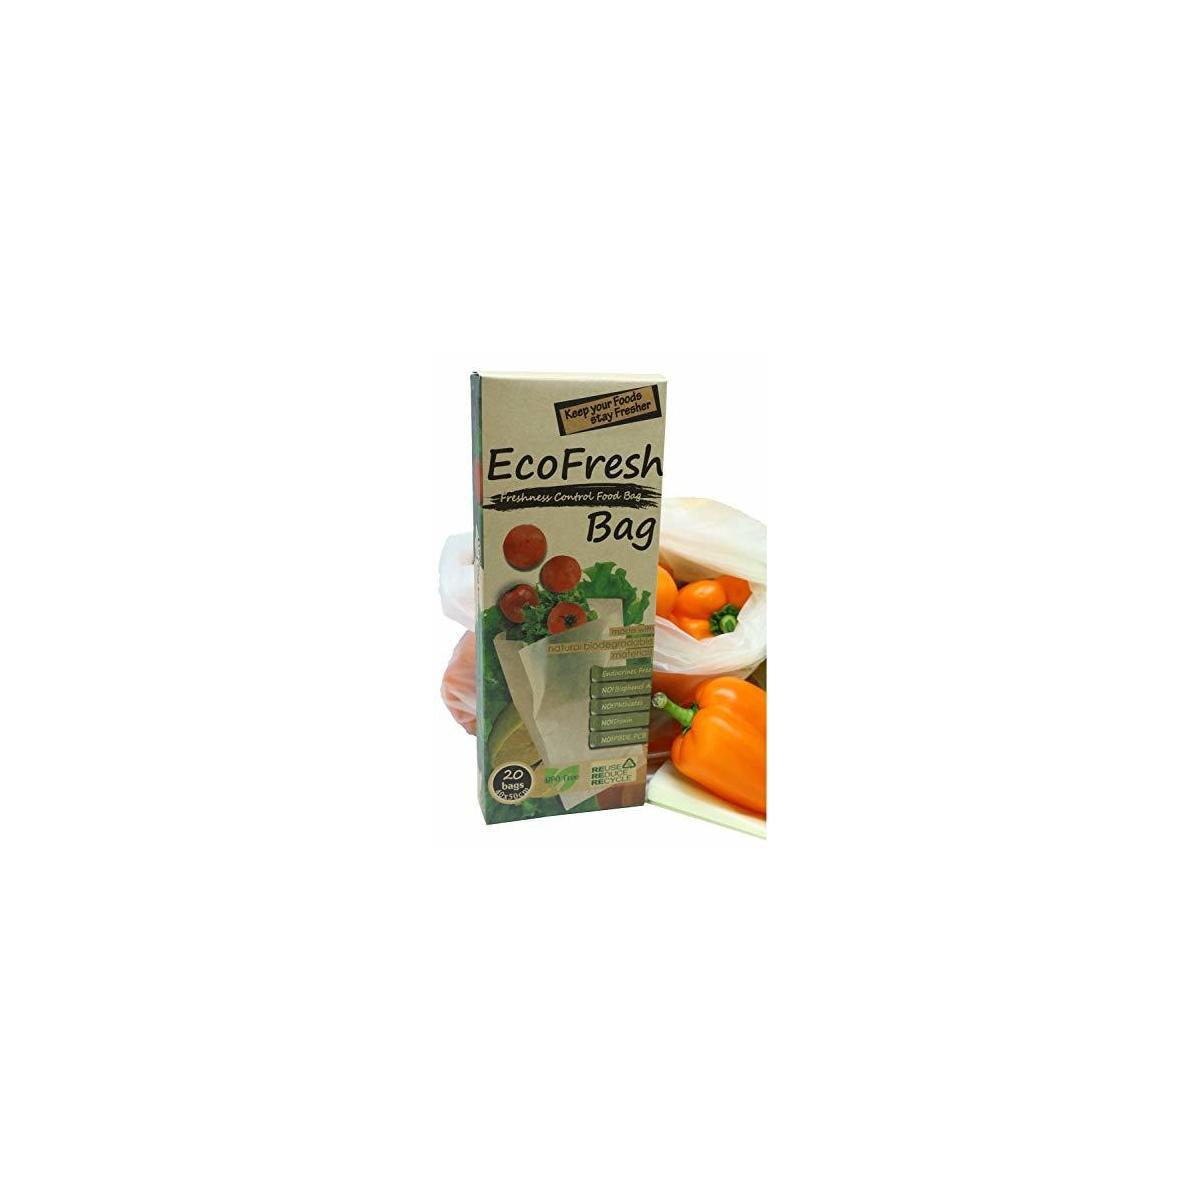 Reusable Produce Saver Bags - BPA Free Food Saver Green Bags, Keep Fruits and Vegetables Fresh Longer - 20pc XL Produce Bags